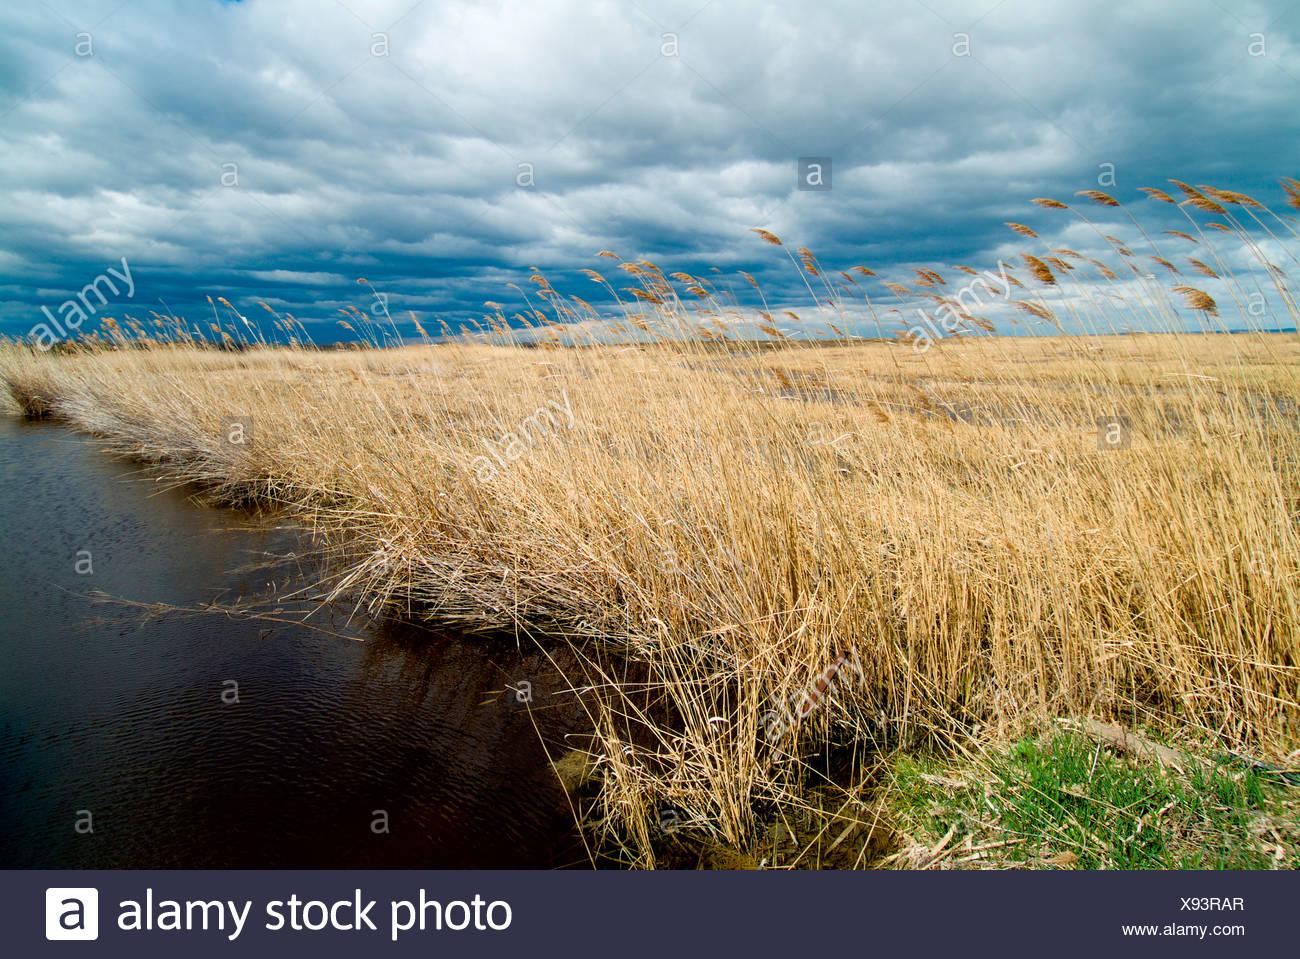 Harvests reeds, Neusiedlersee Lake, Burgenland, Austria, Europe Stock Photo